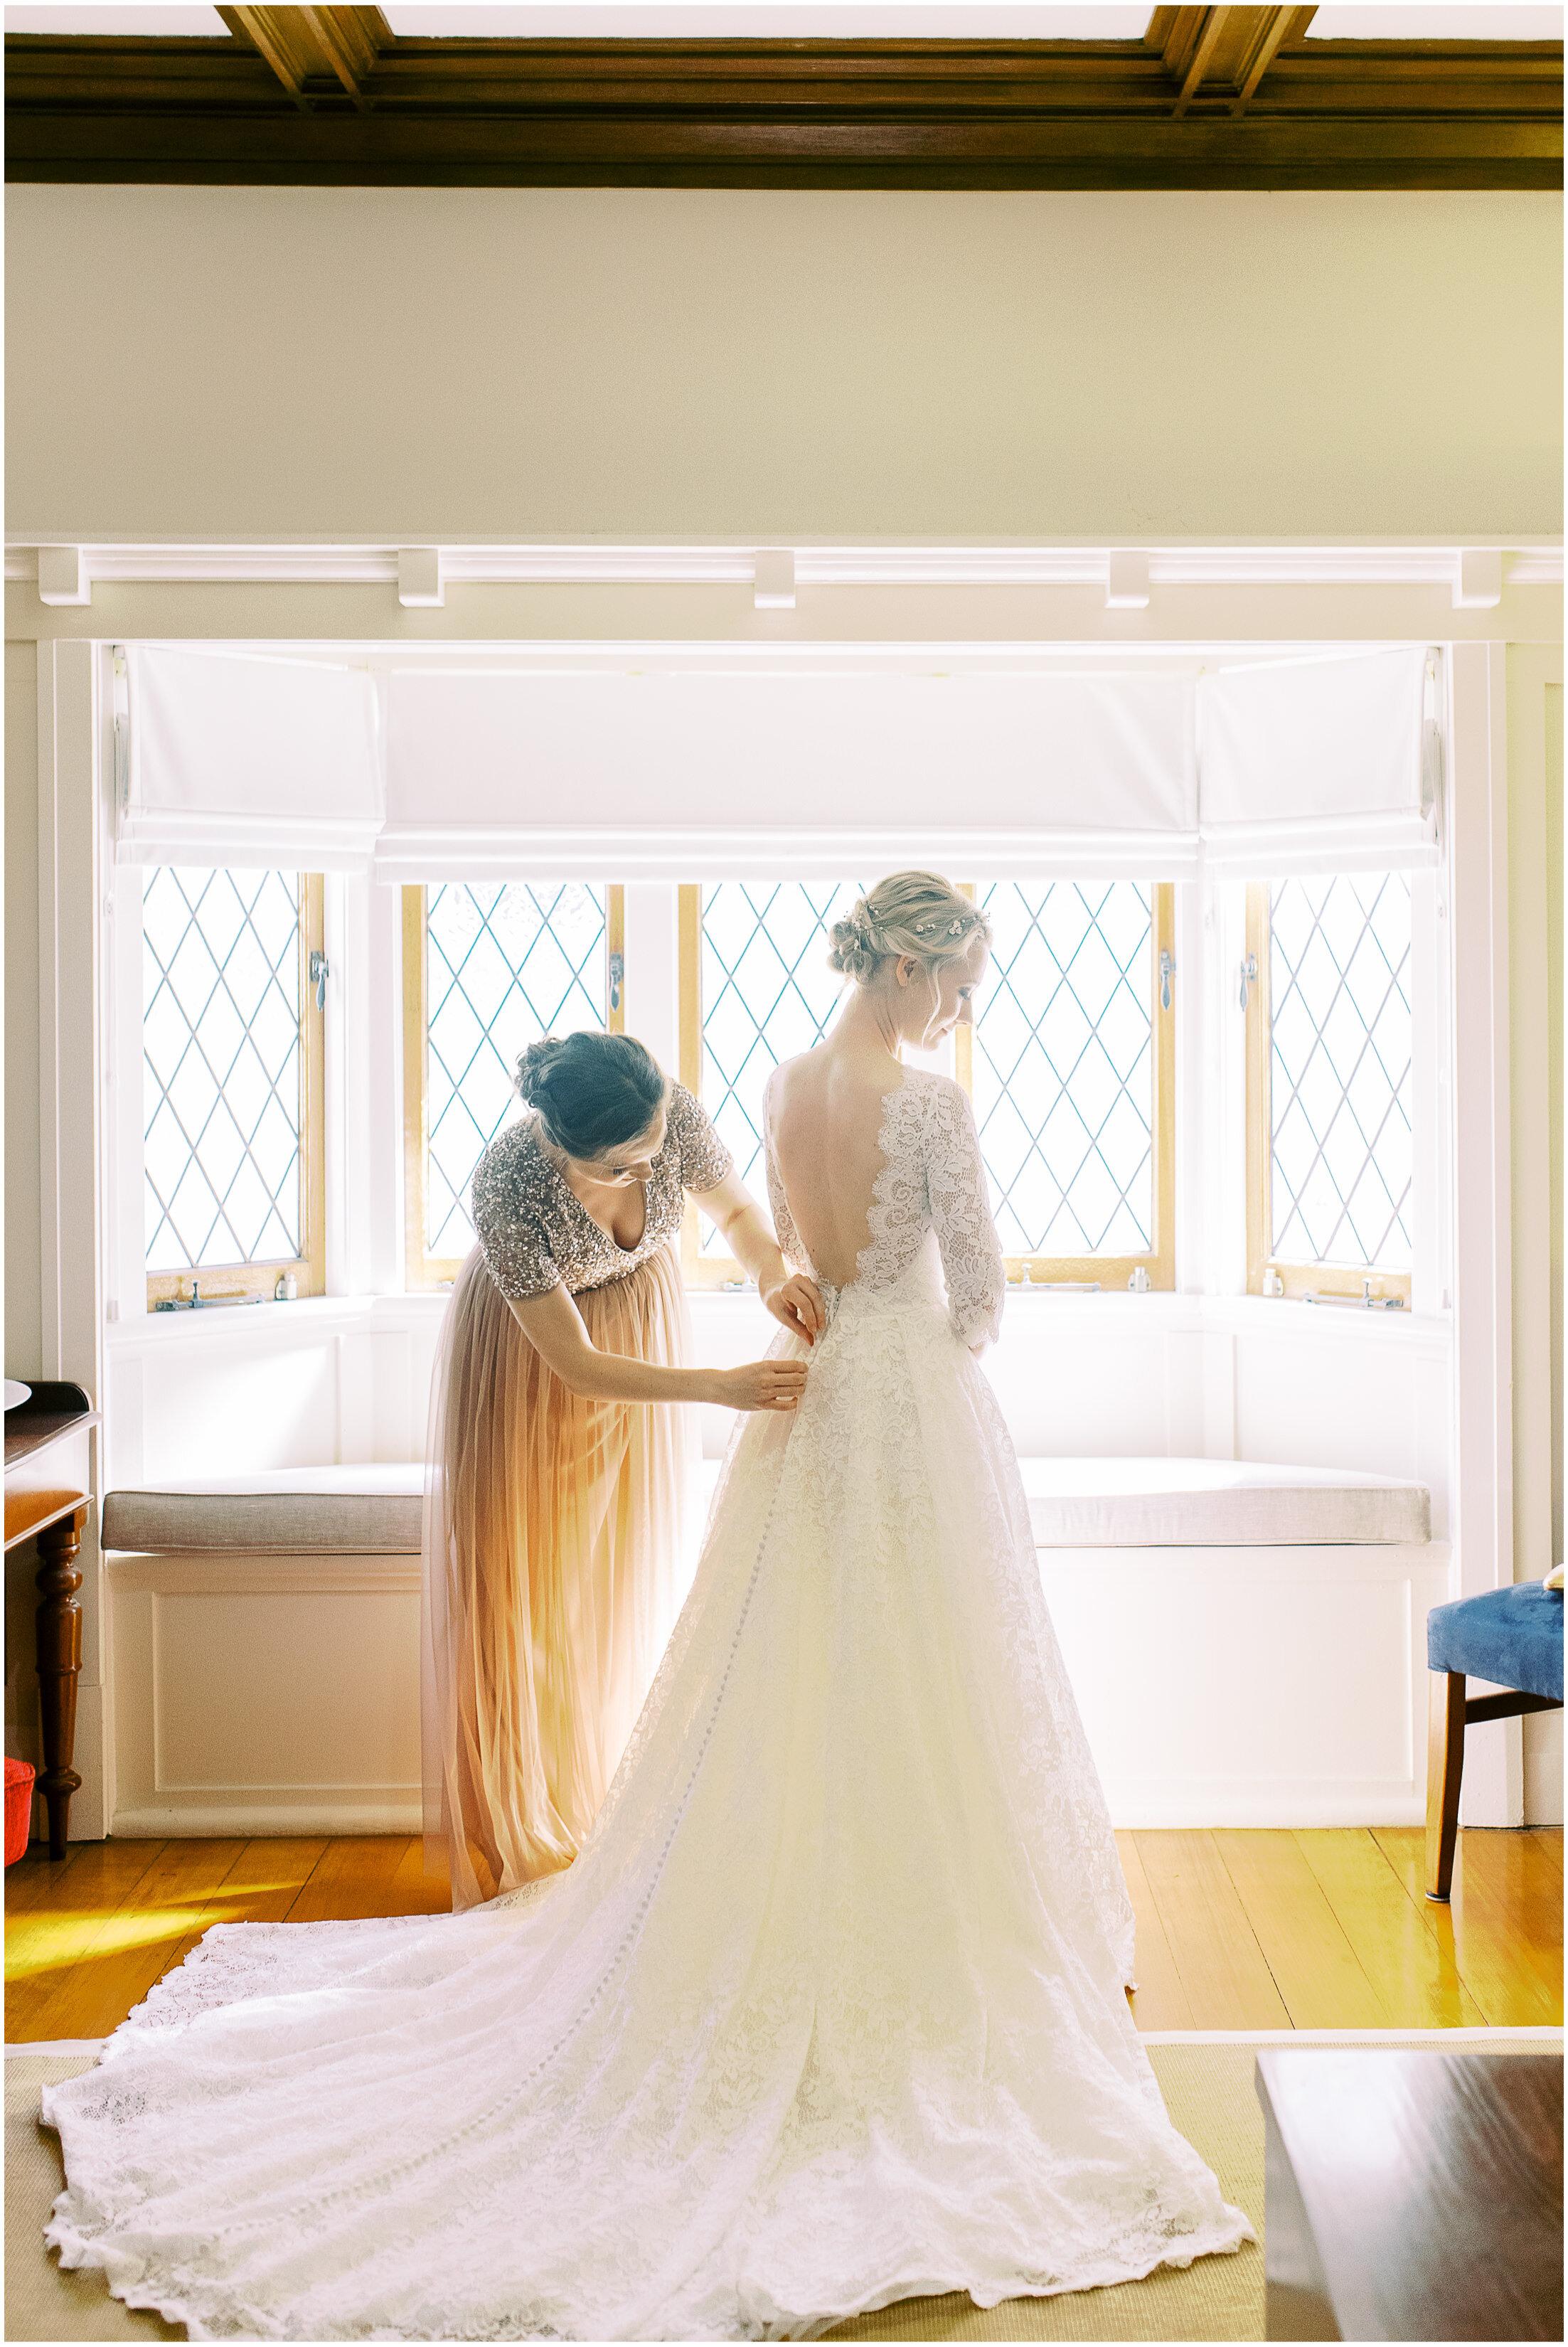 brisbane-fine-art-wedding-photographer-lauren-olivia-luxury-wedding-australia-01.jpg